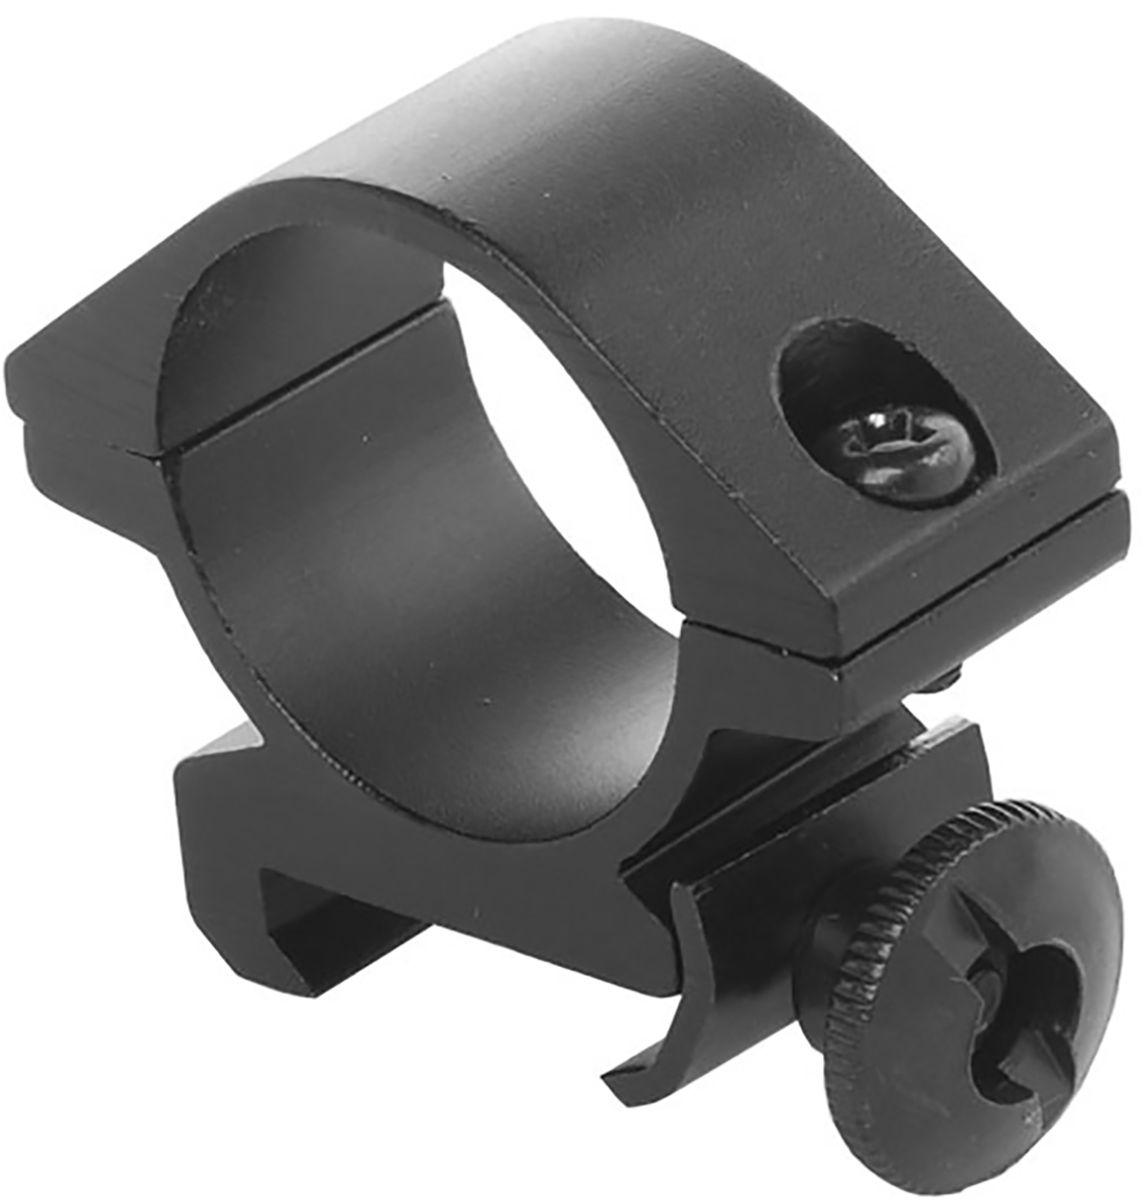 Кронштейн-кольцо для фонаря Nextorch Weaver. Picatinny, цвет: черный, диаметр 25 мм tactical x300 pistol gun light 500 lumens high output weapon flashlight fit 20mm picatinny weaver rail